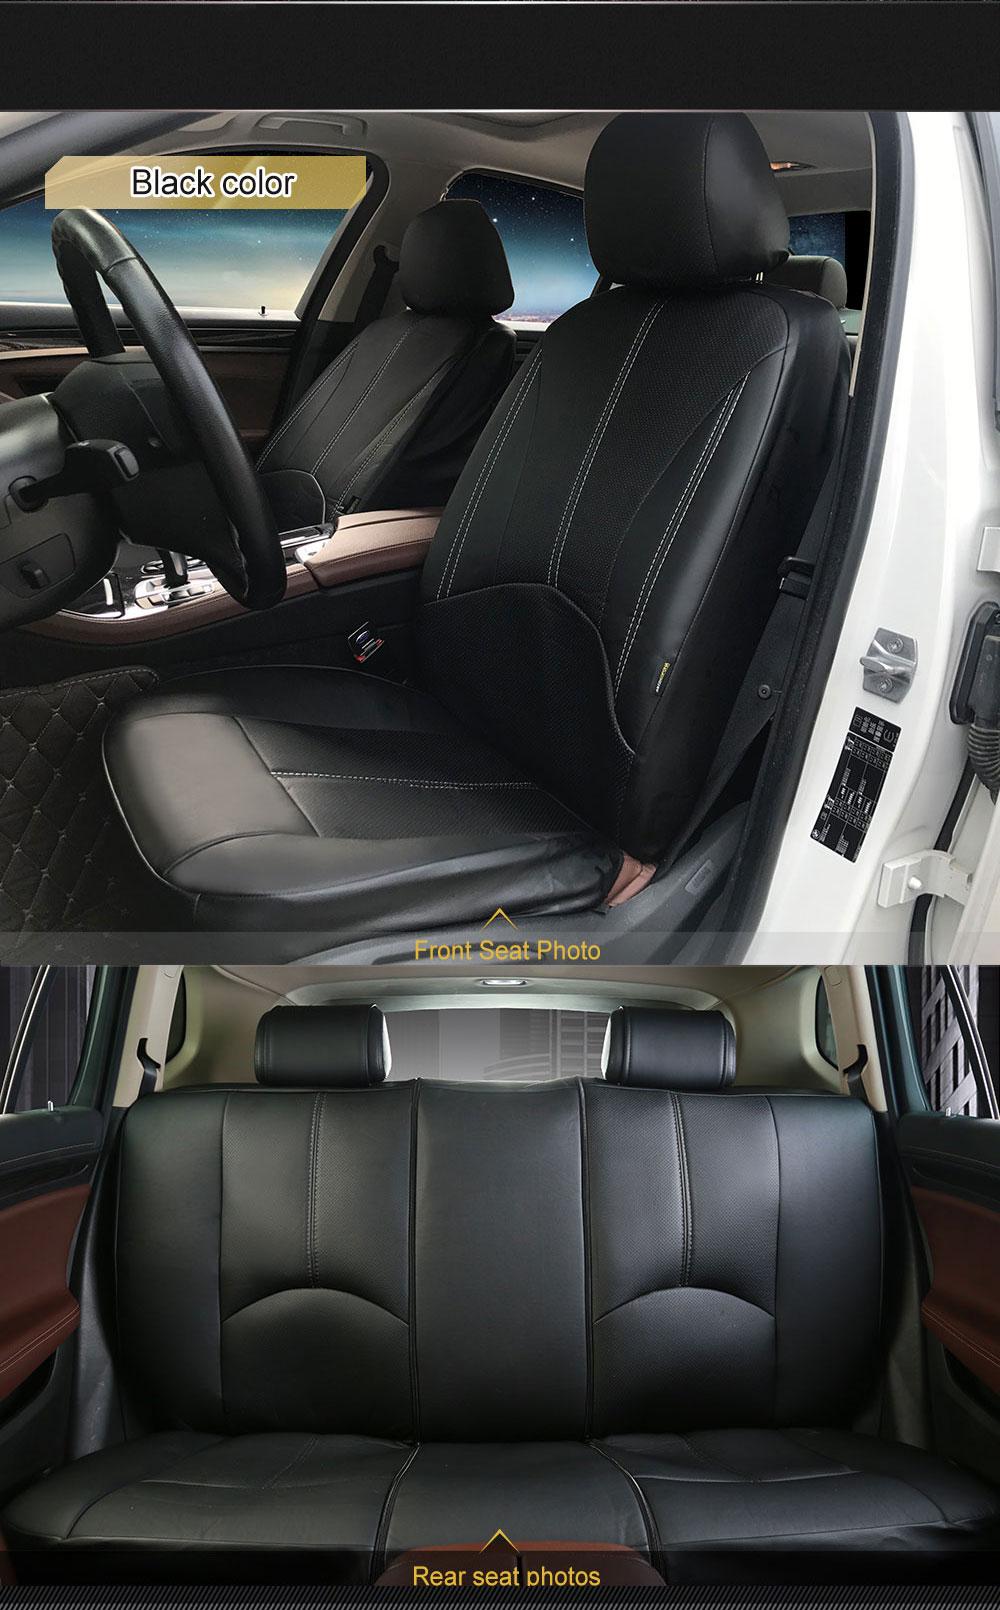 Pu Leather Universal Auto Car Seat Covers Anti Slip Seat Covers Front Back Seat Protectors For Car Lada Honda Kia Rio 3 Seat